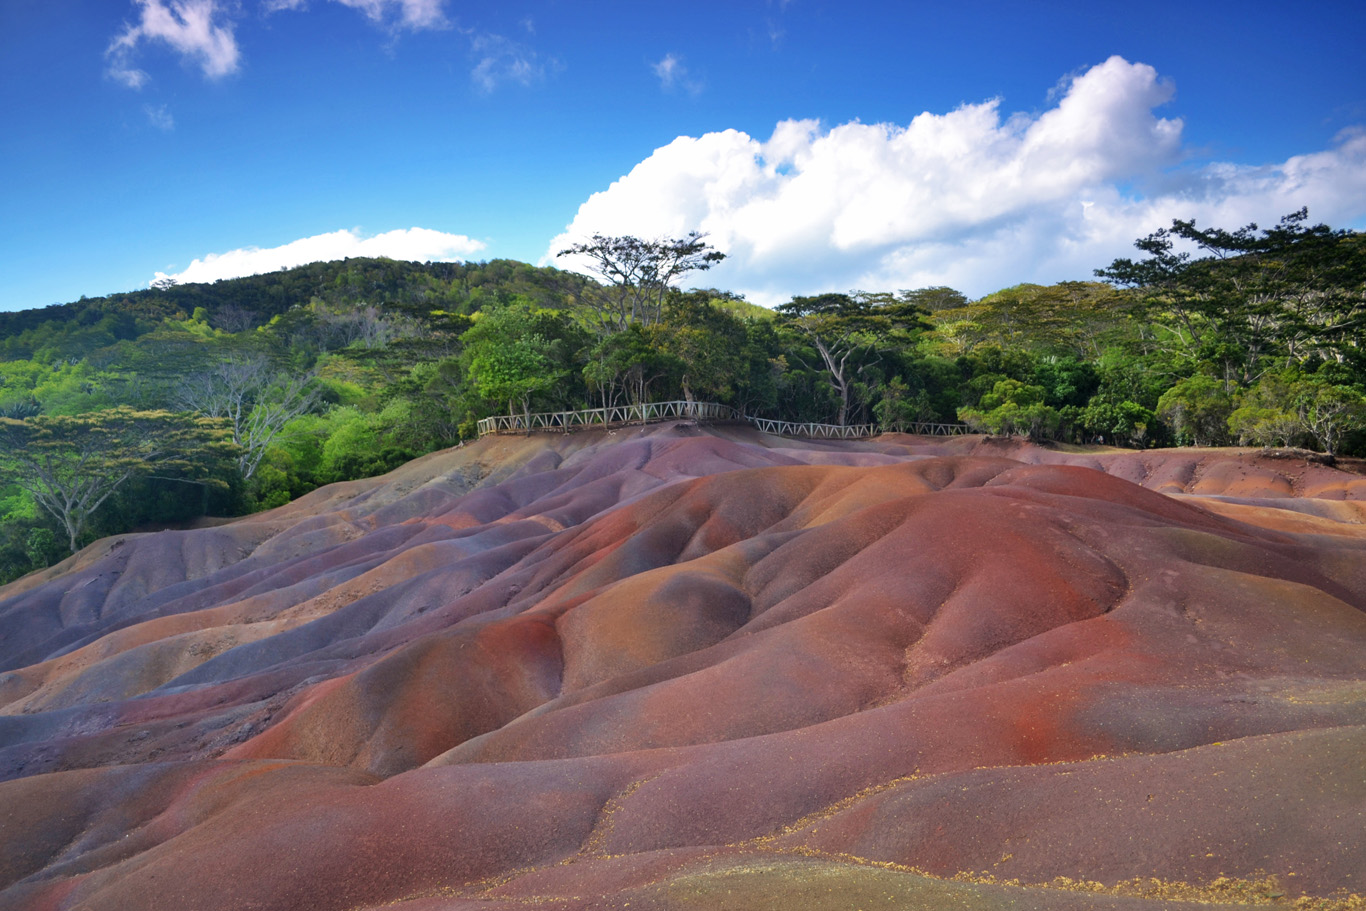 Seven colored earths